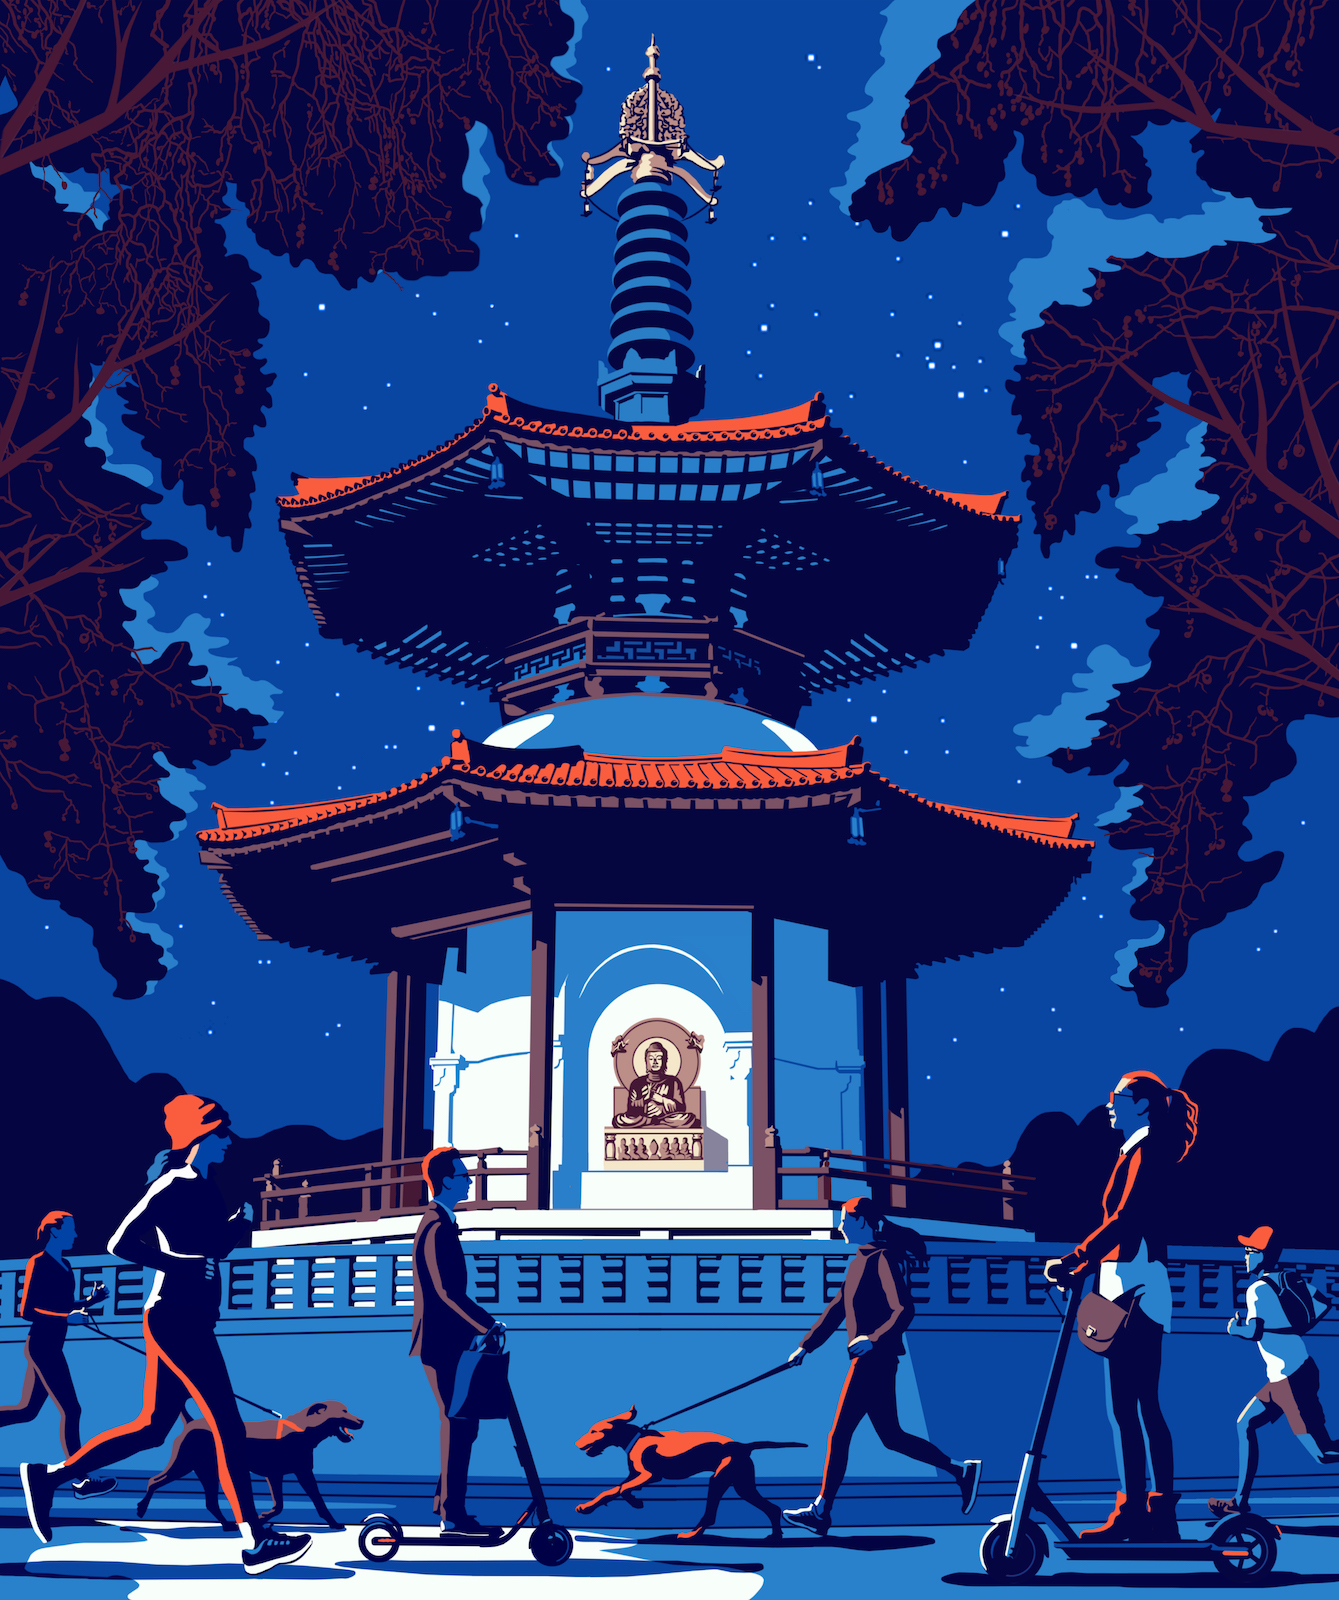 Bill Butcher / London Pagoda / The Art Movement